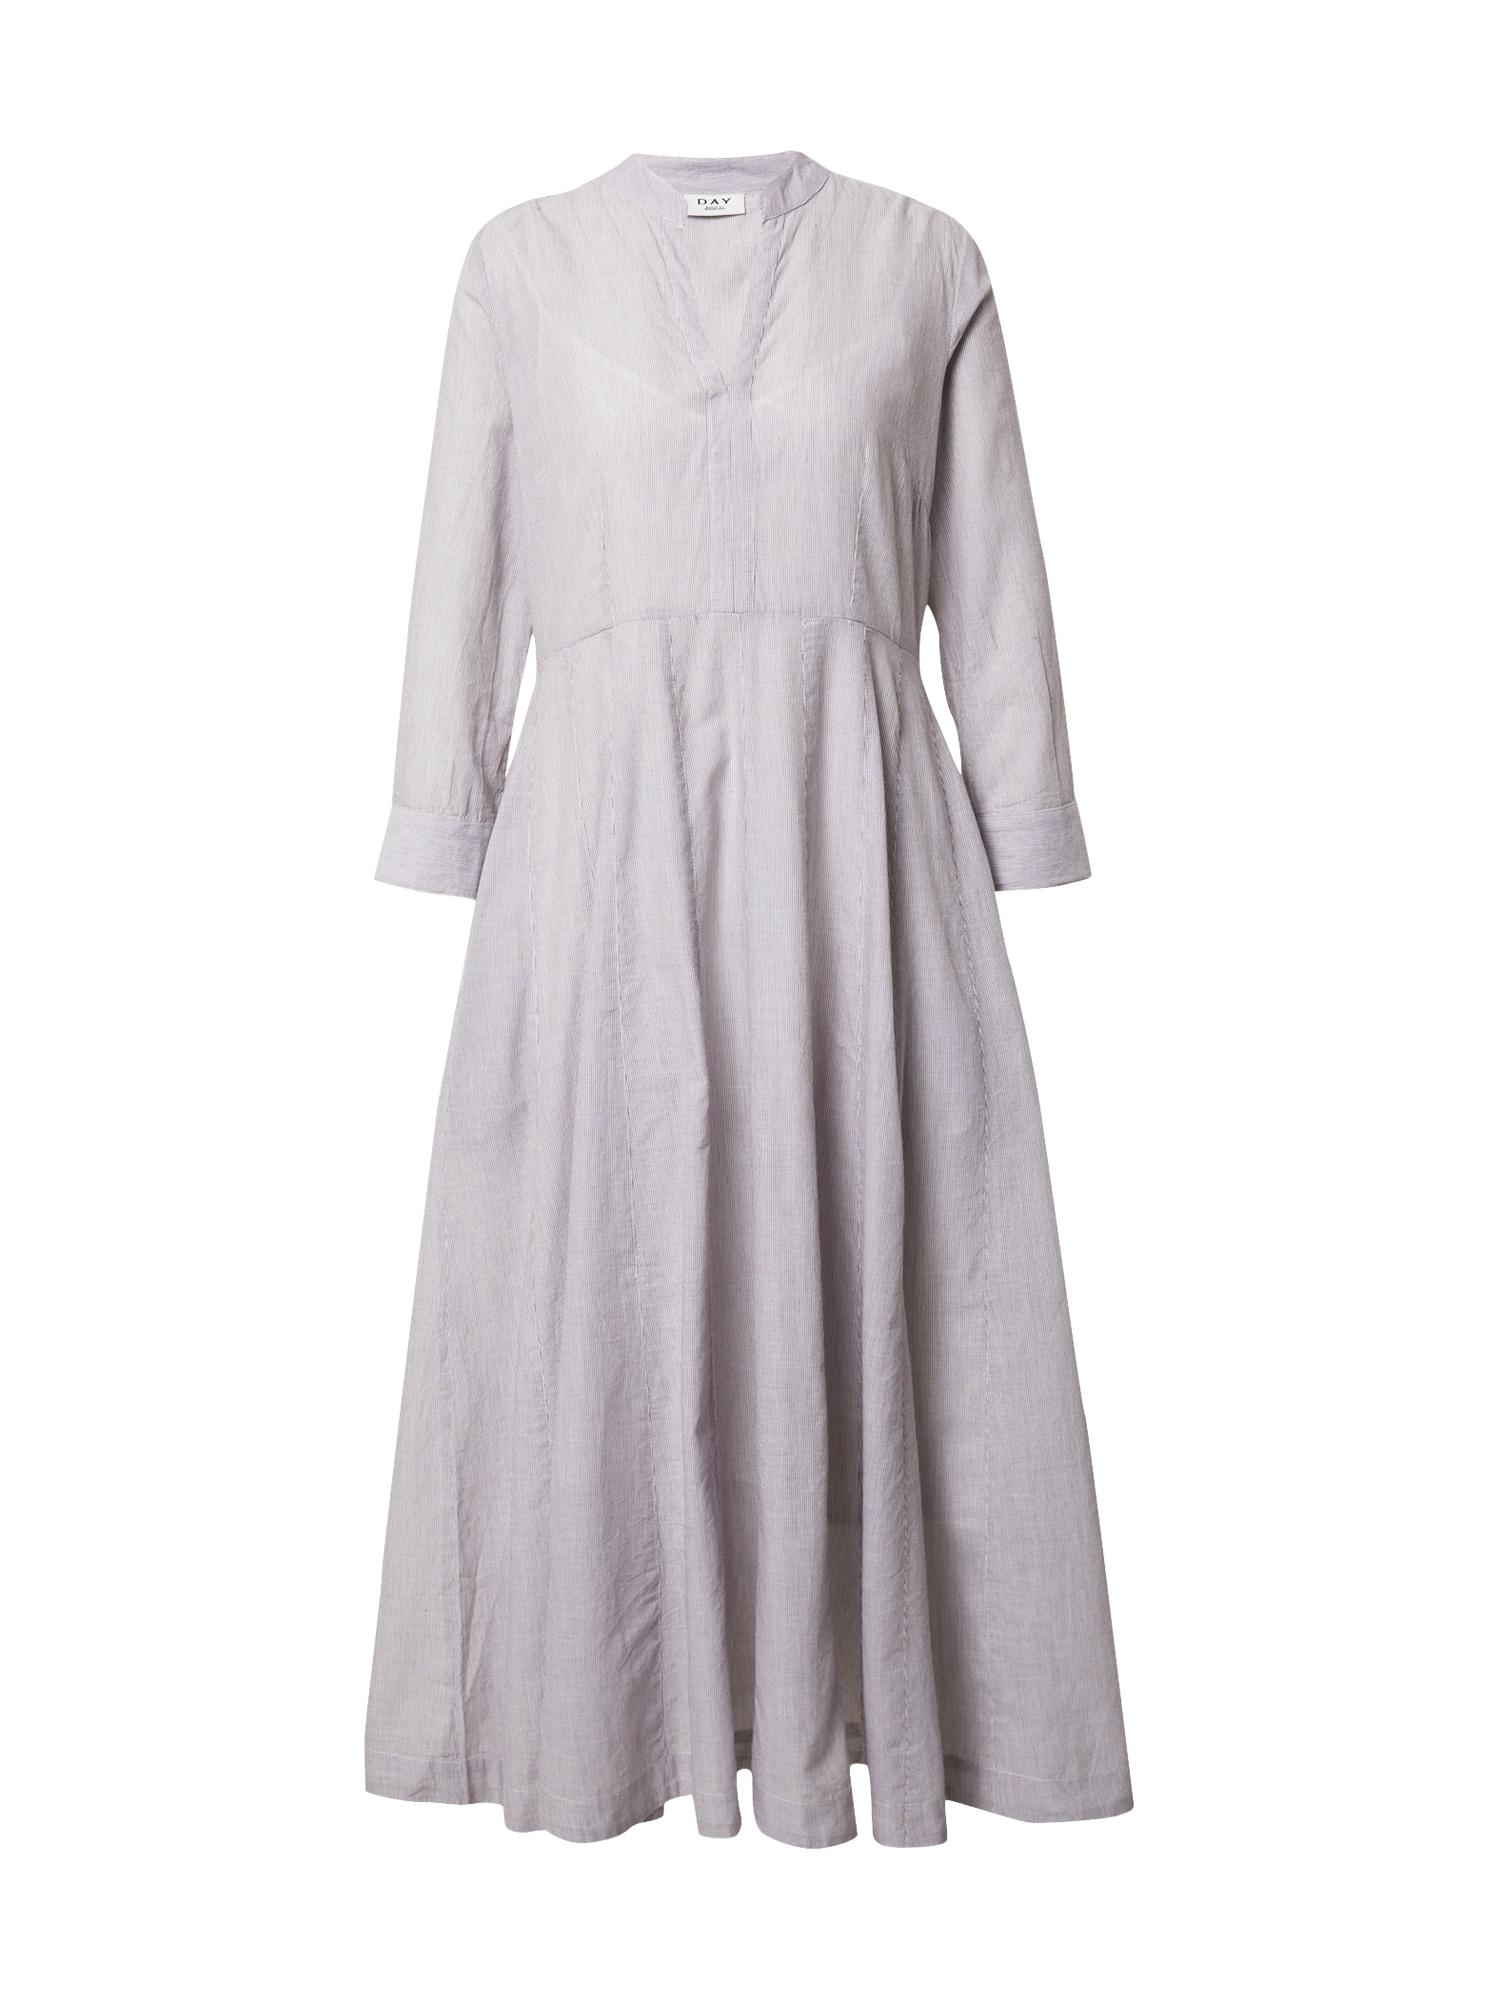 DAY BIRGER ET MIKKELSEN Palaidinės tipo suknelė